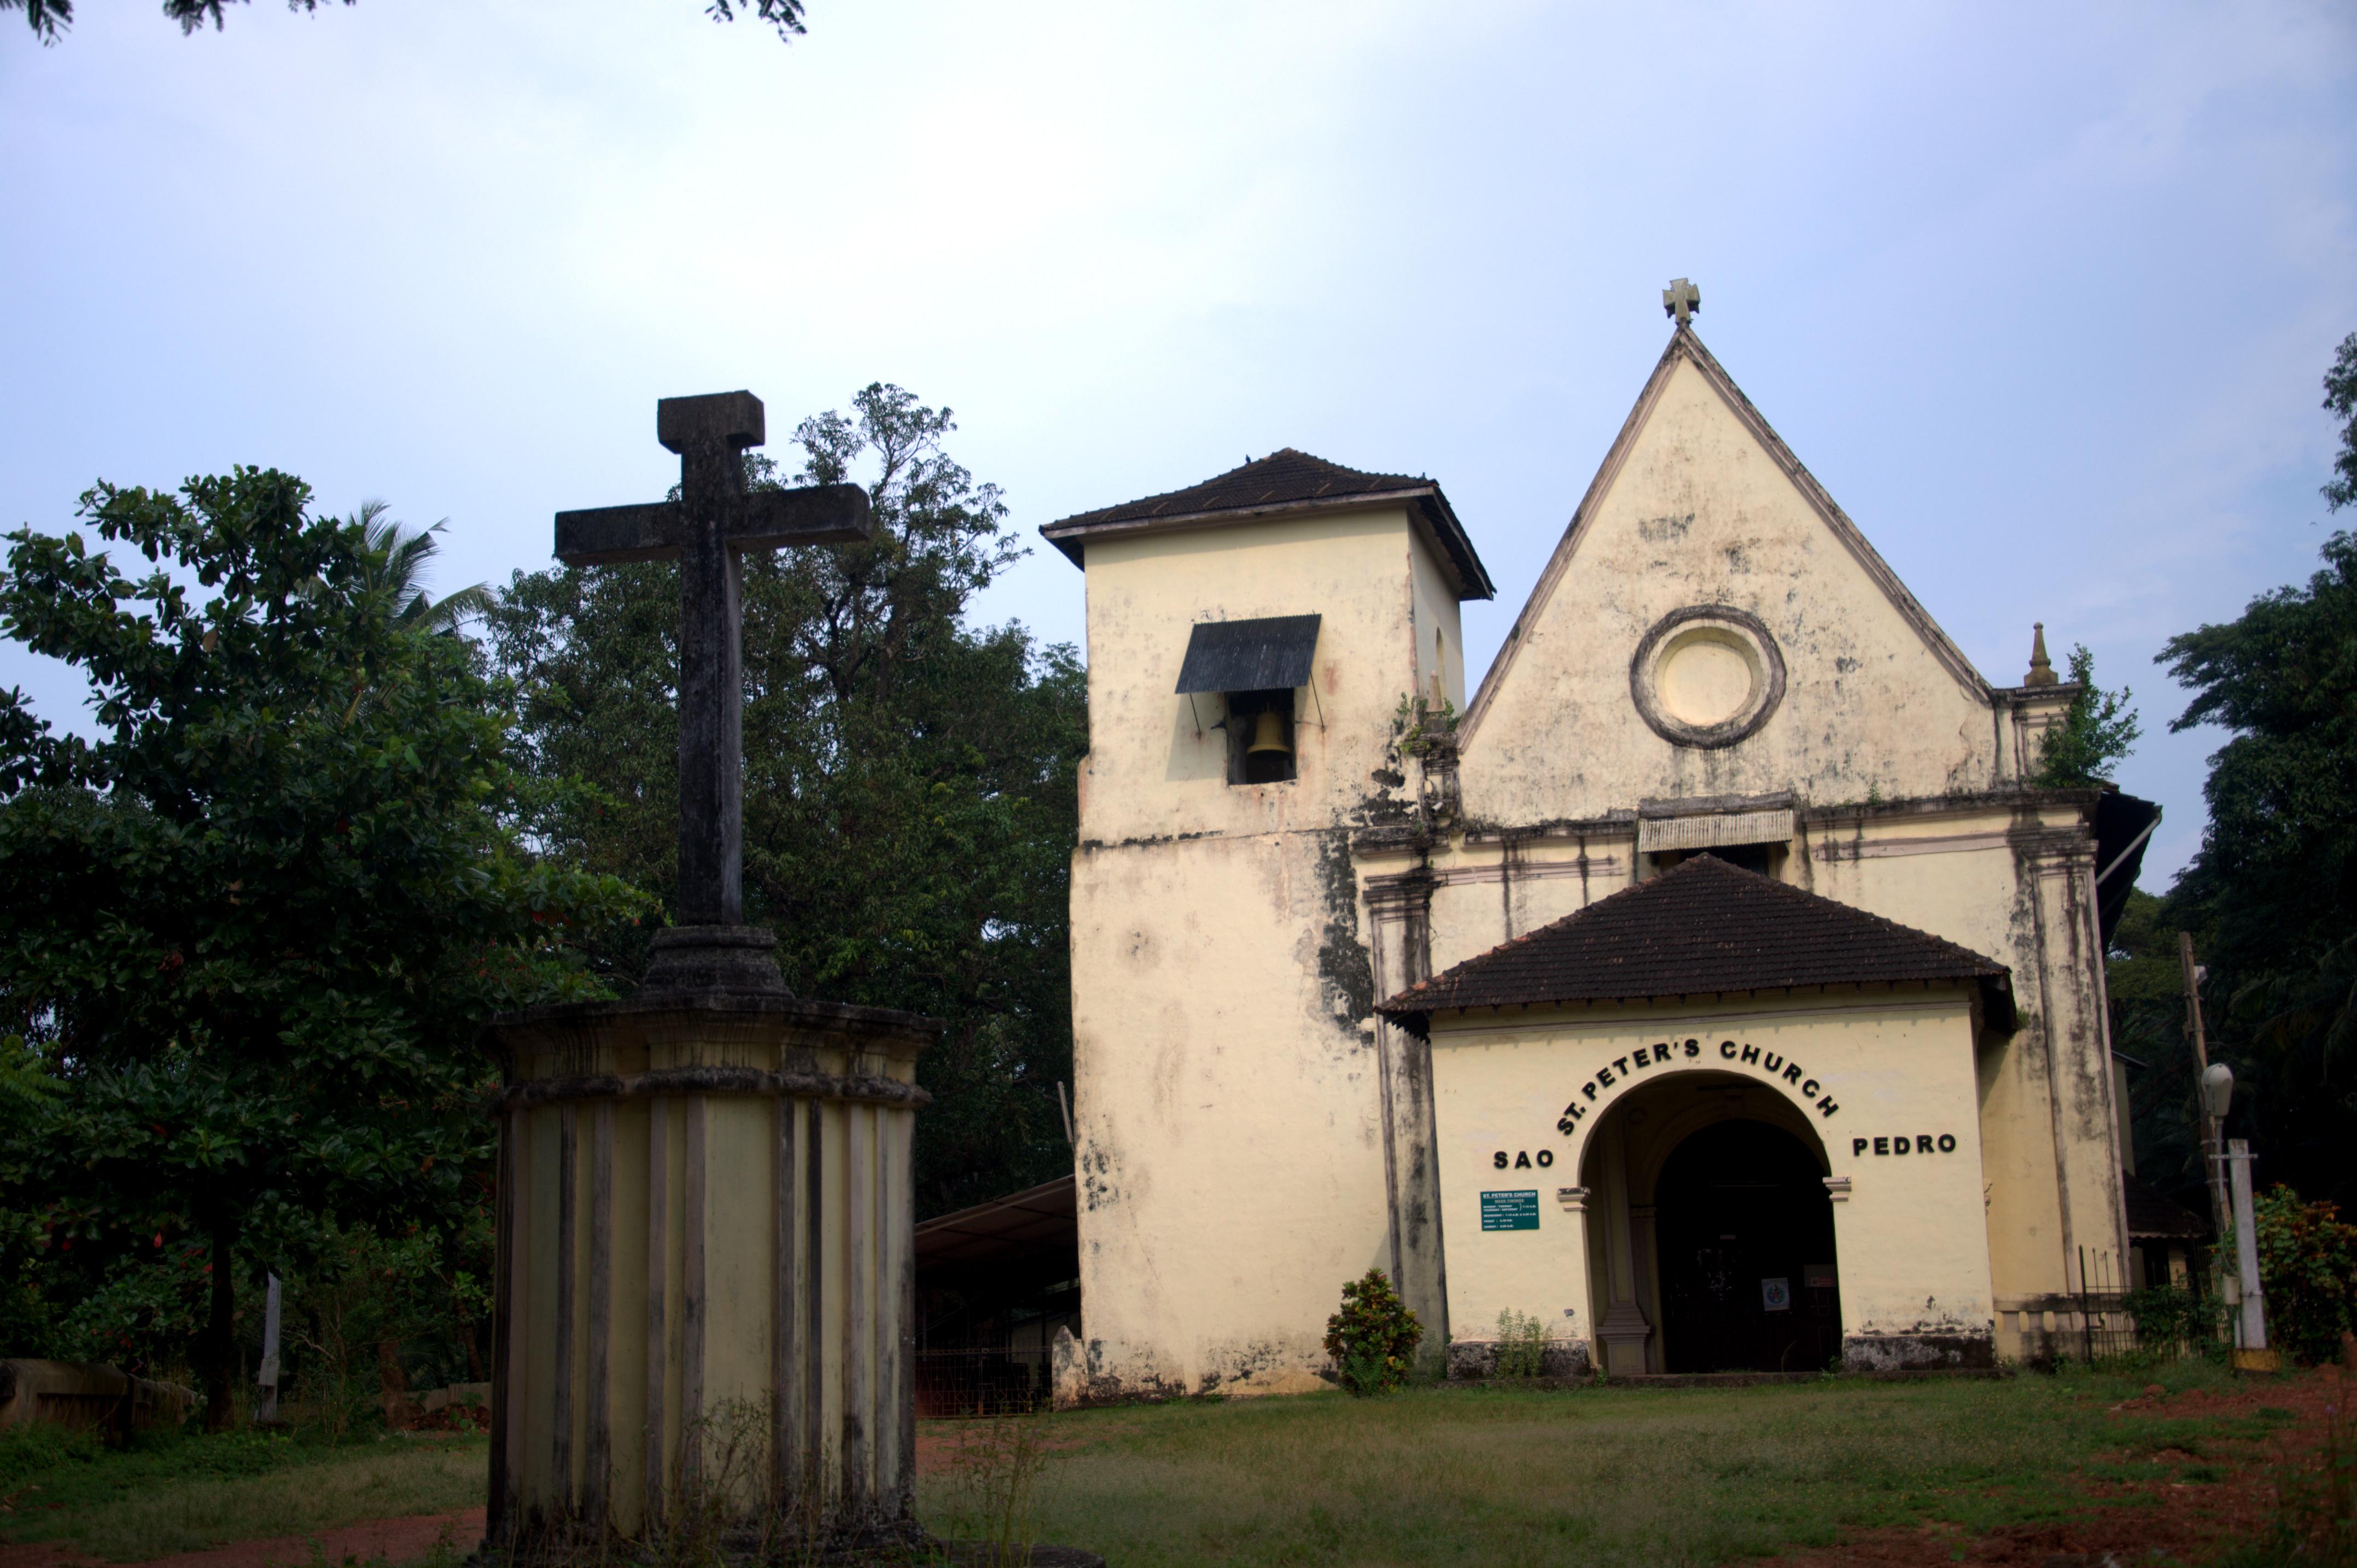 Churches Goa Wikipedia File:old Goa,church of st